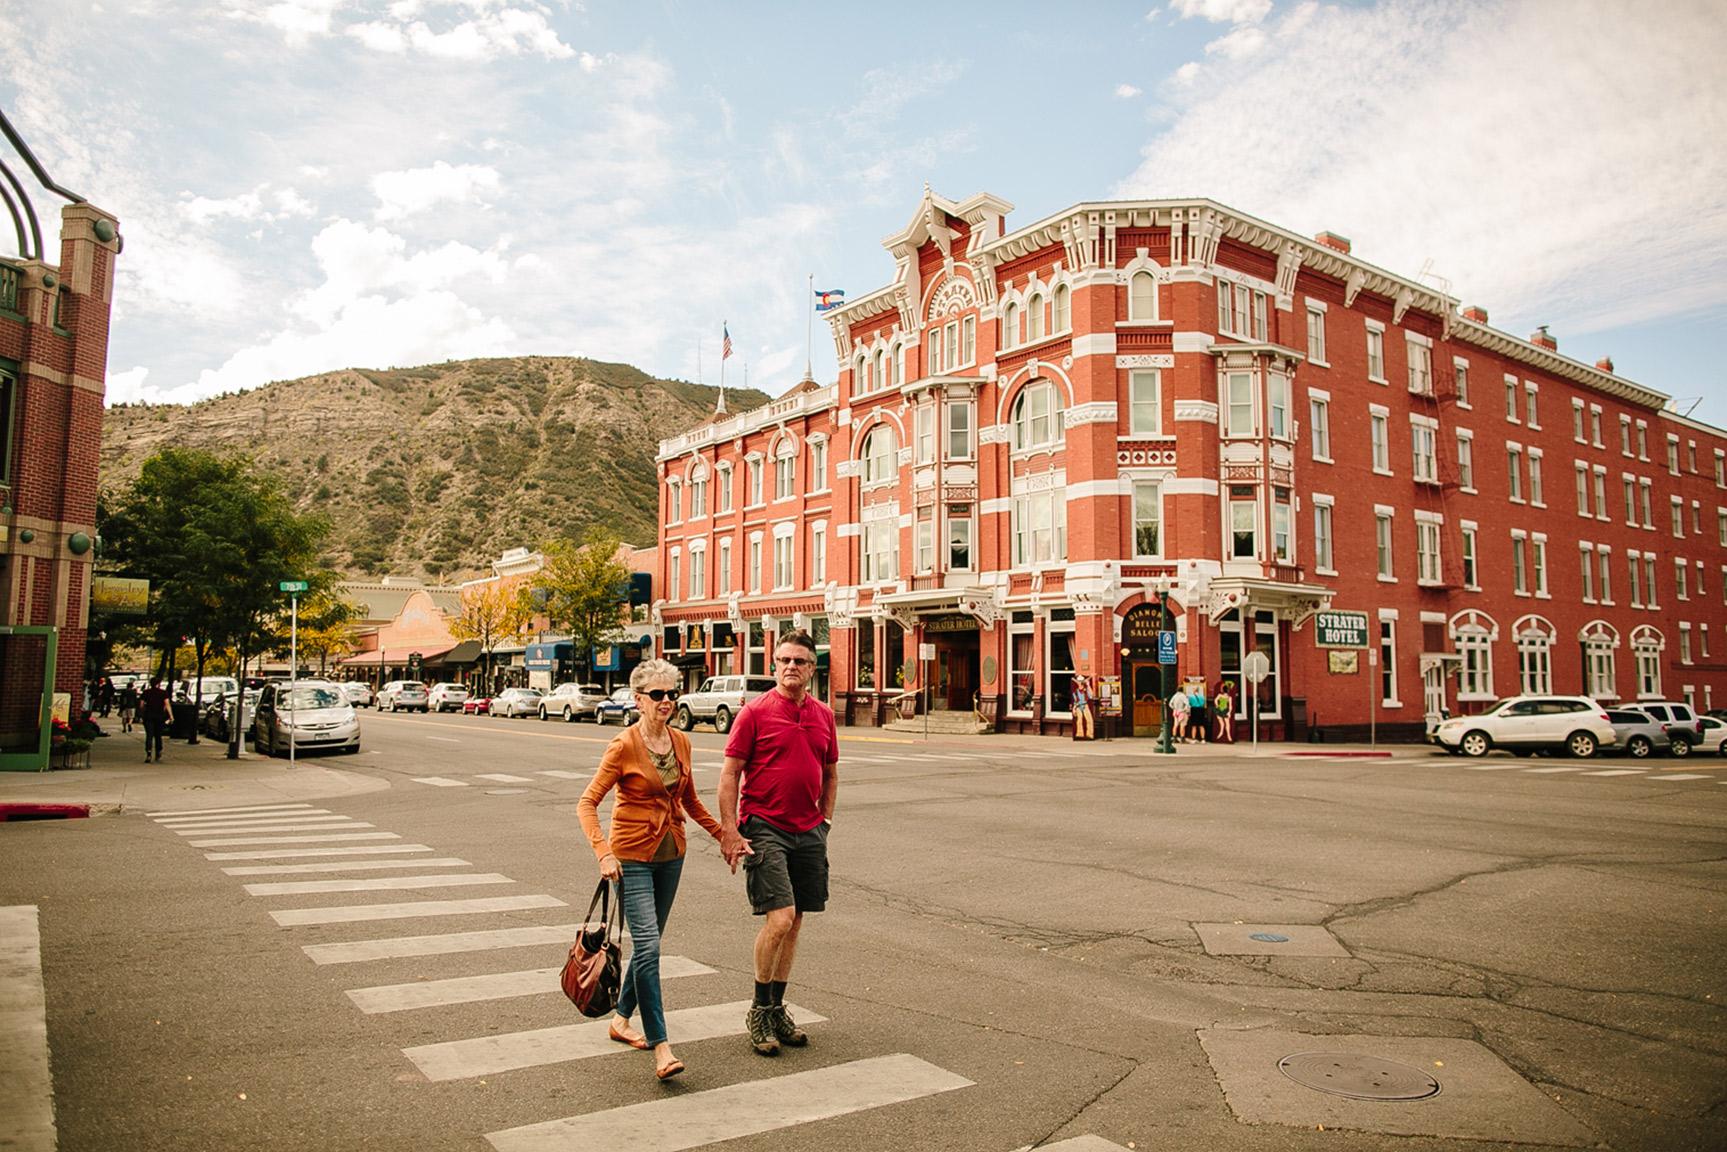 ColoradoWeddingphotographer-PhotobyBetsy101.JPG